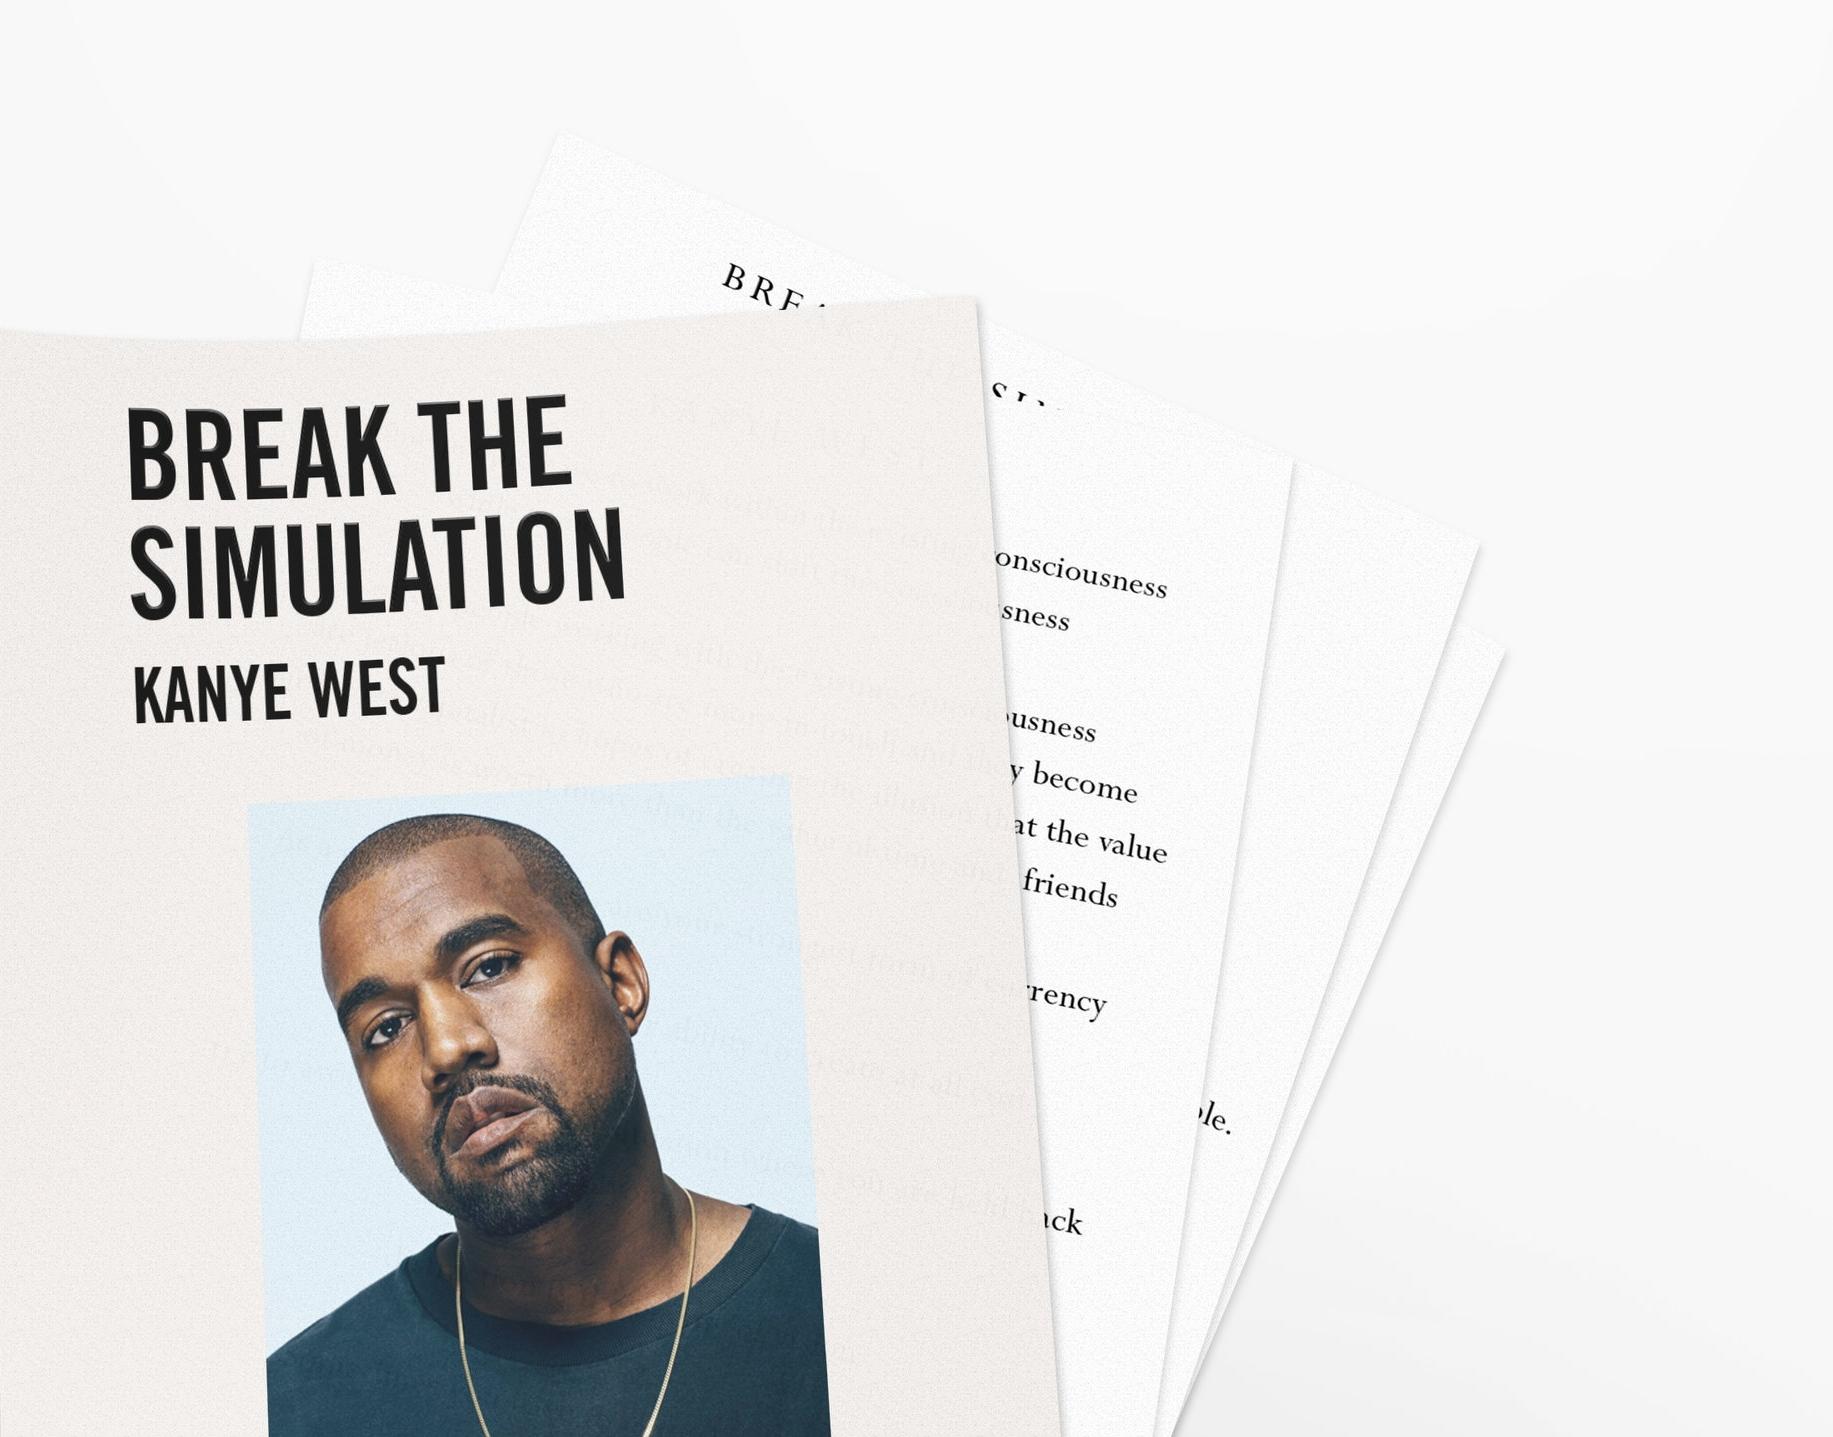 BreakTheSimulation_Paperstack.jpg